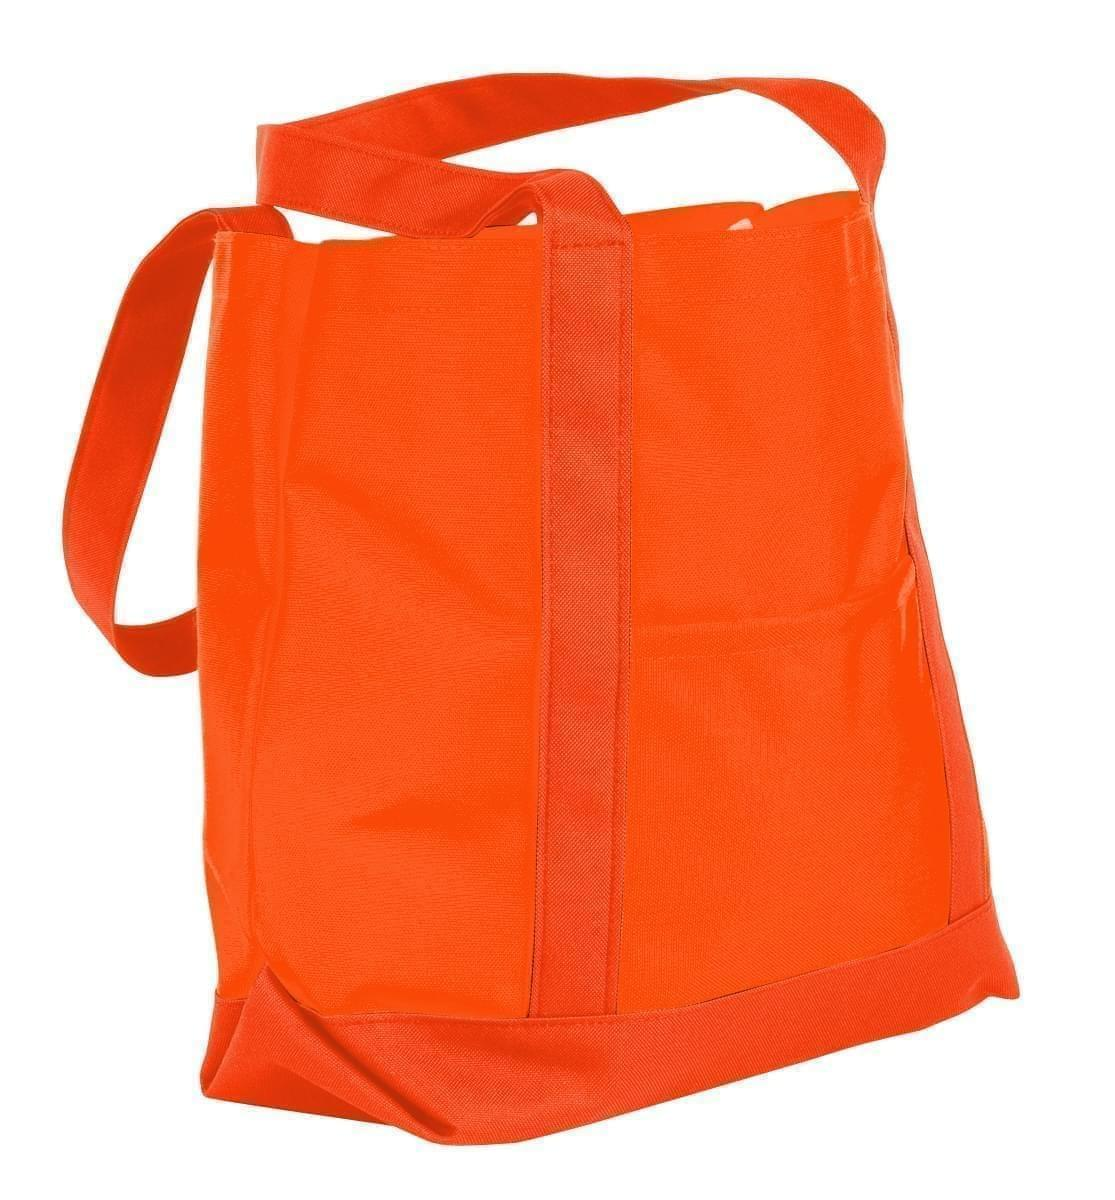 USA Made Nylon Poly Boat Tote Bags, Orange-Orange, XAACL1UAXJ